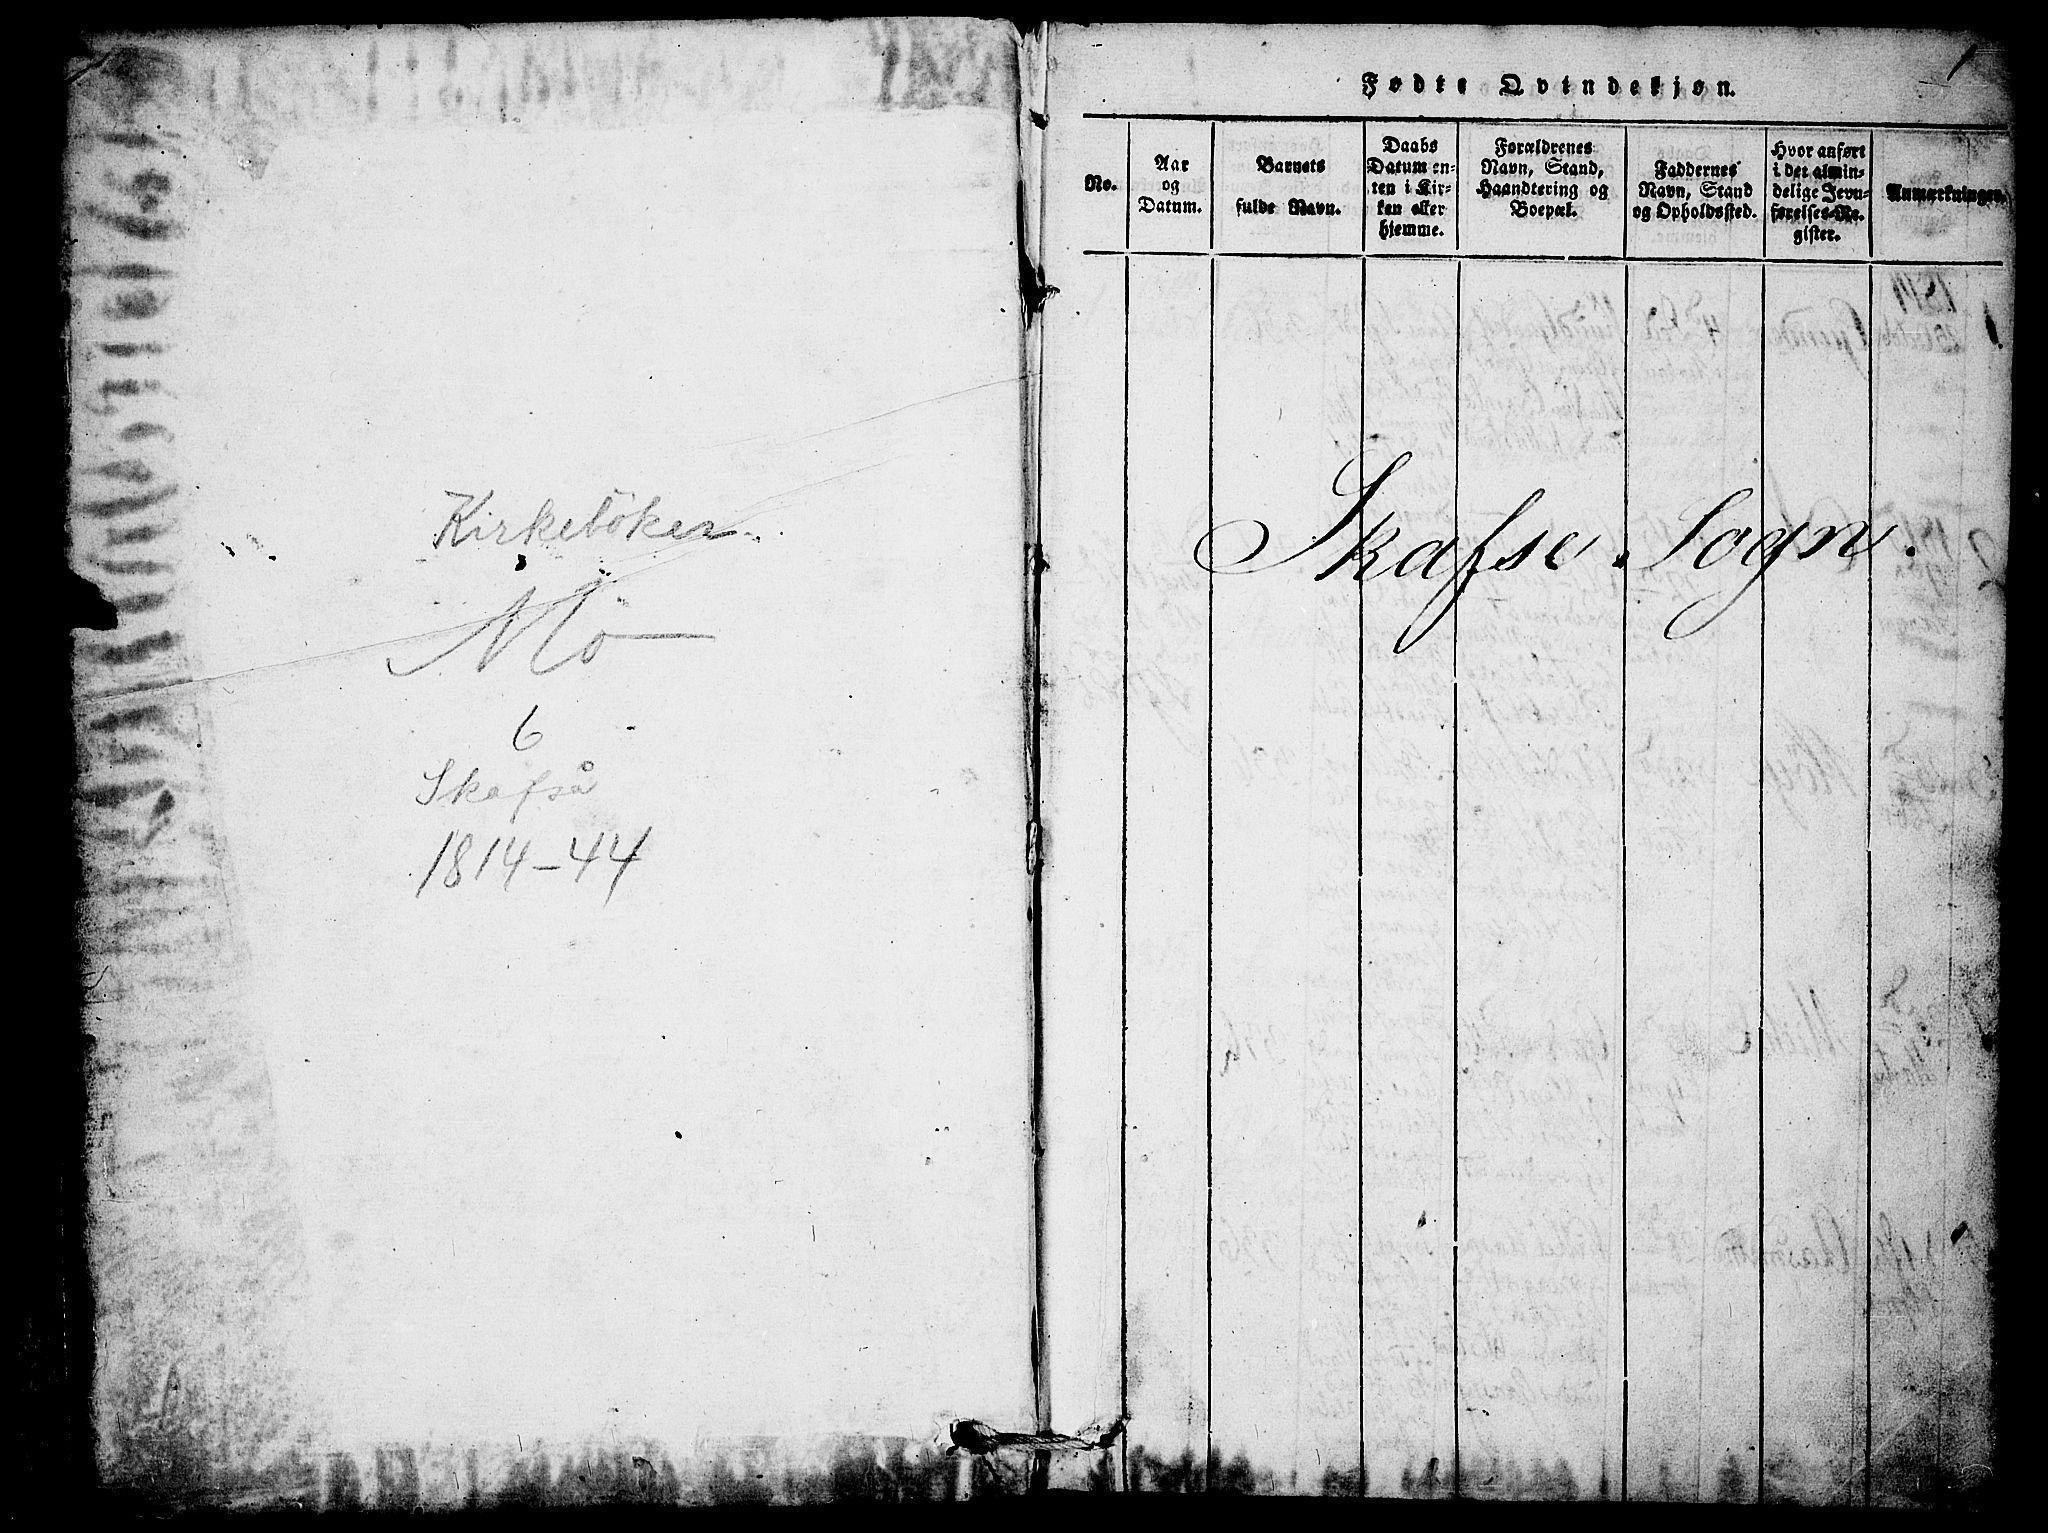 SAKO, Mo kirkebøker, F/Fb/L0001: Ministerialbok nr. II 1, 1814-1844, s. 1